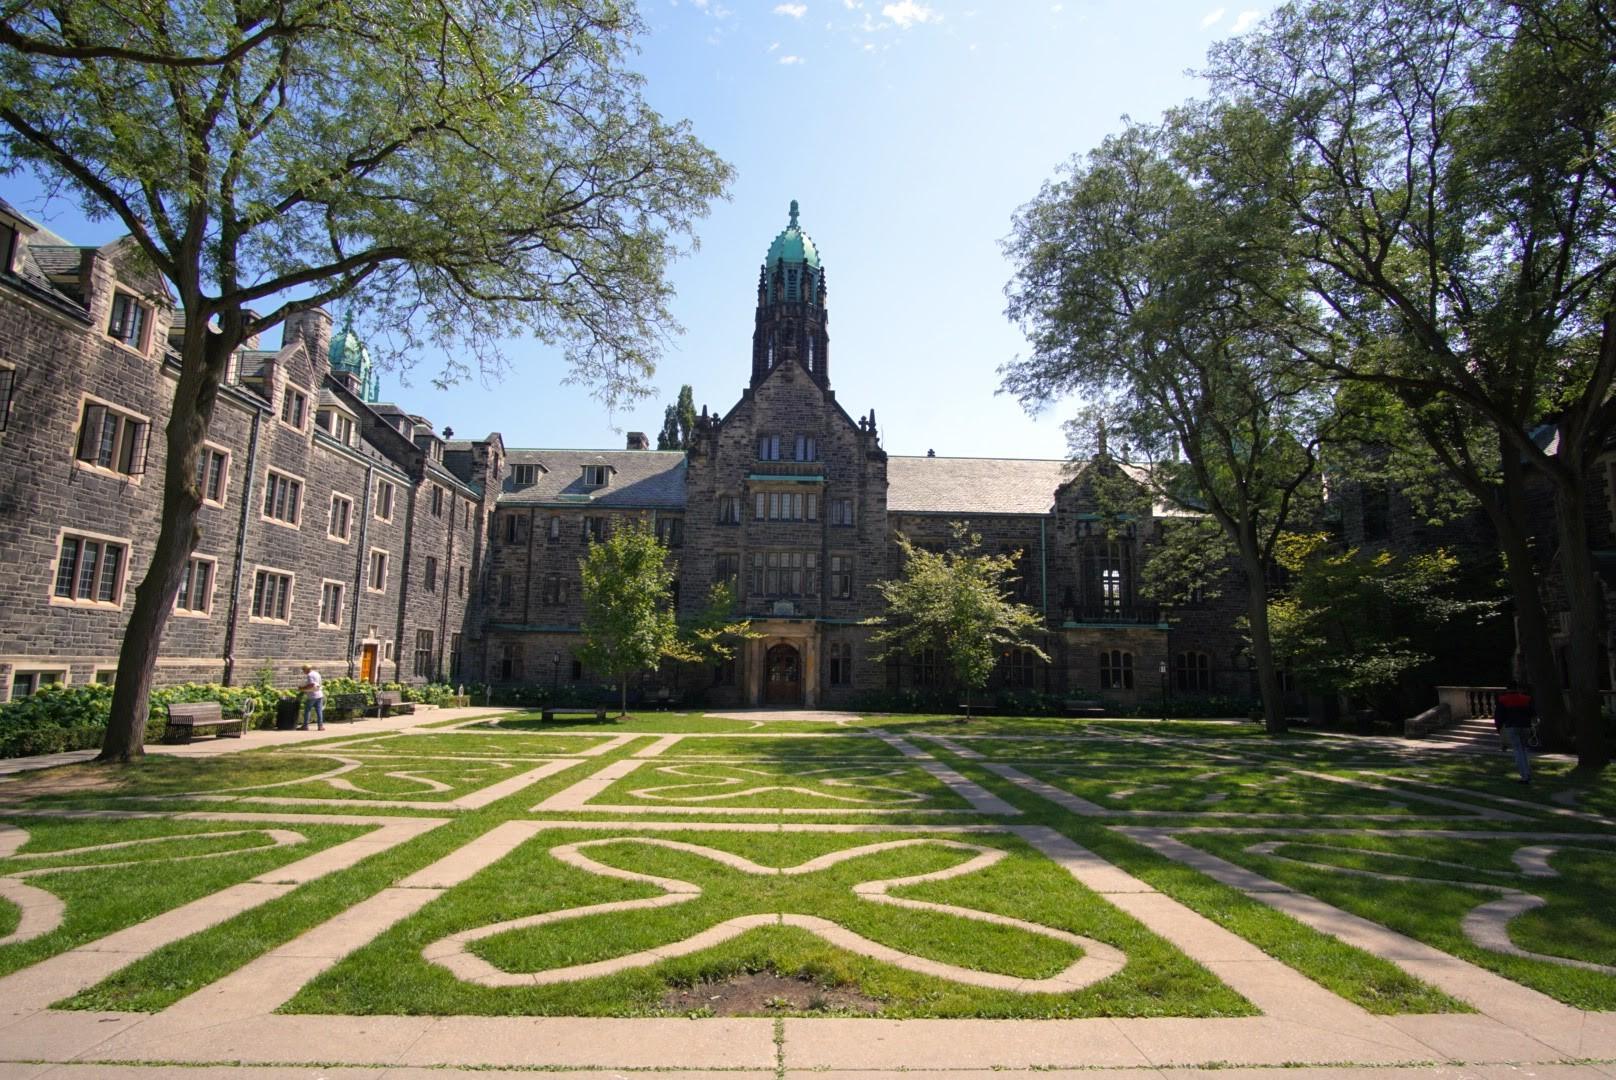 The Quad at Trinity College